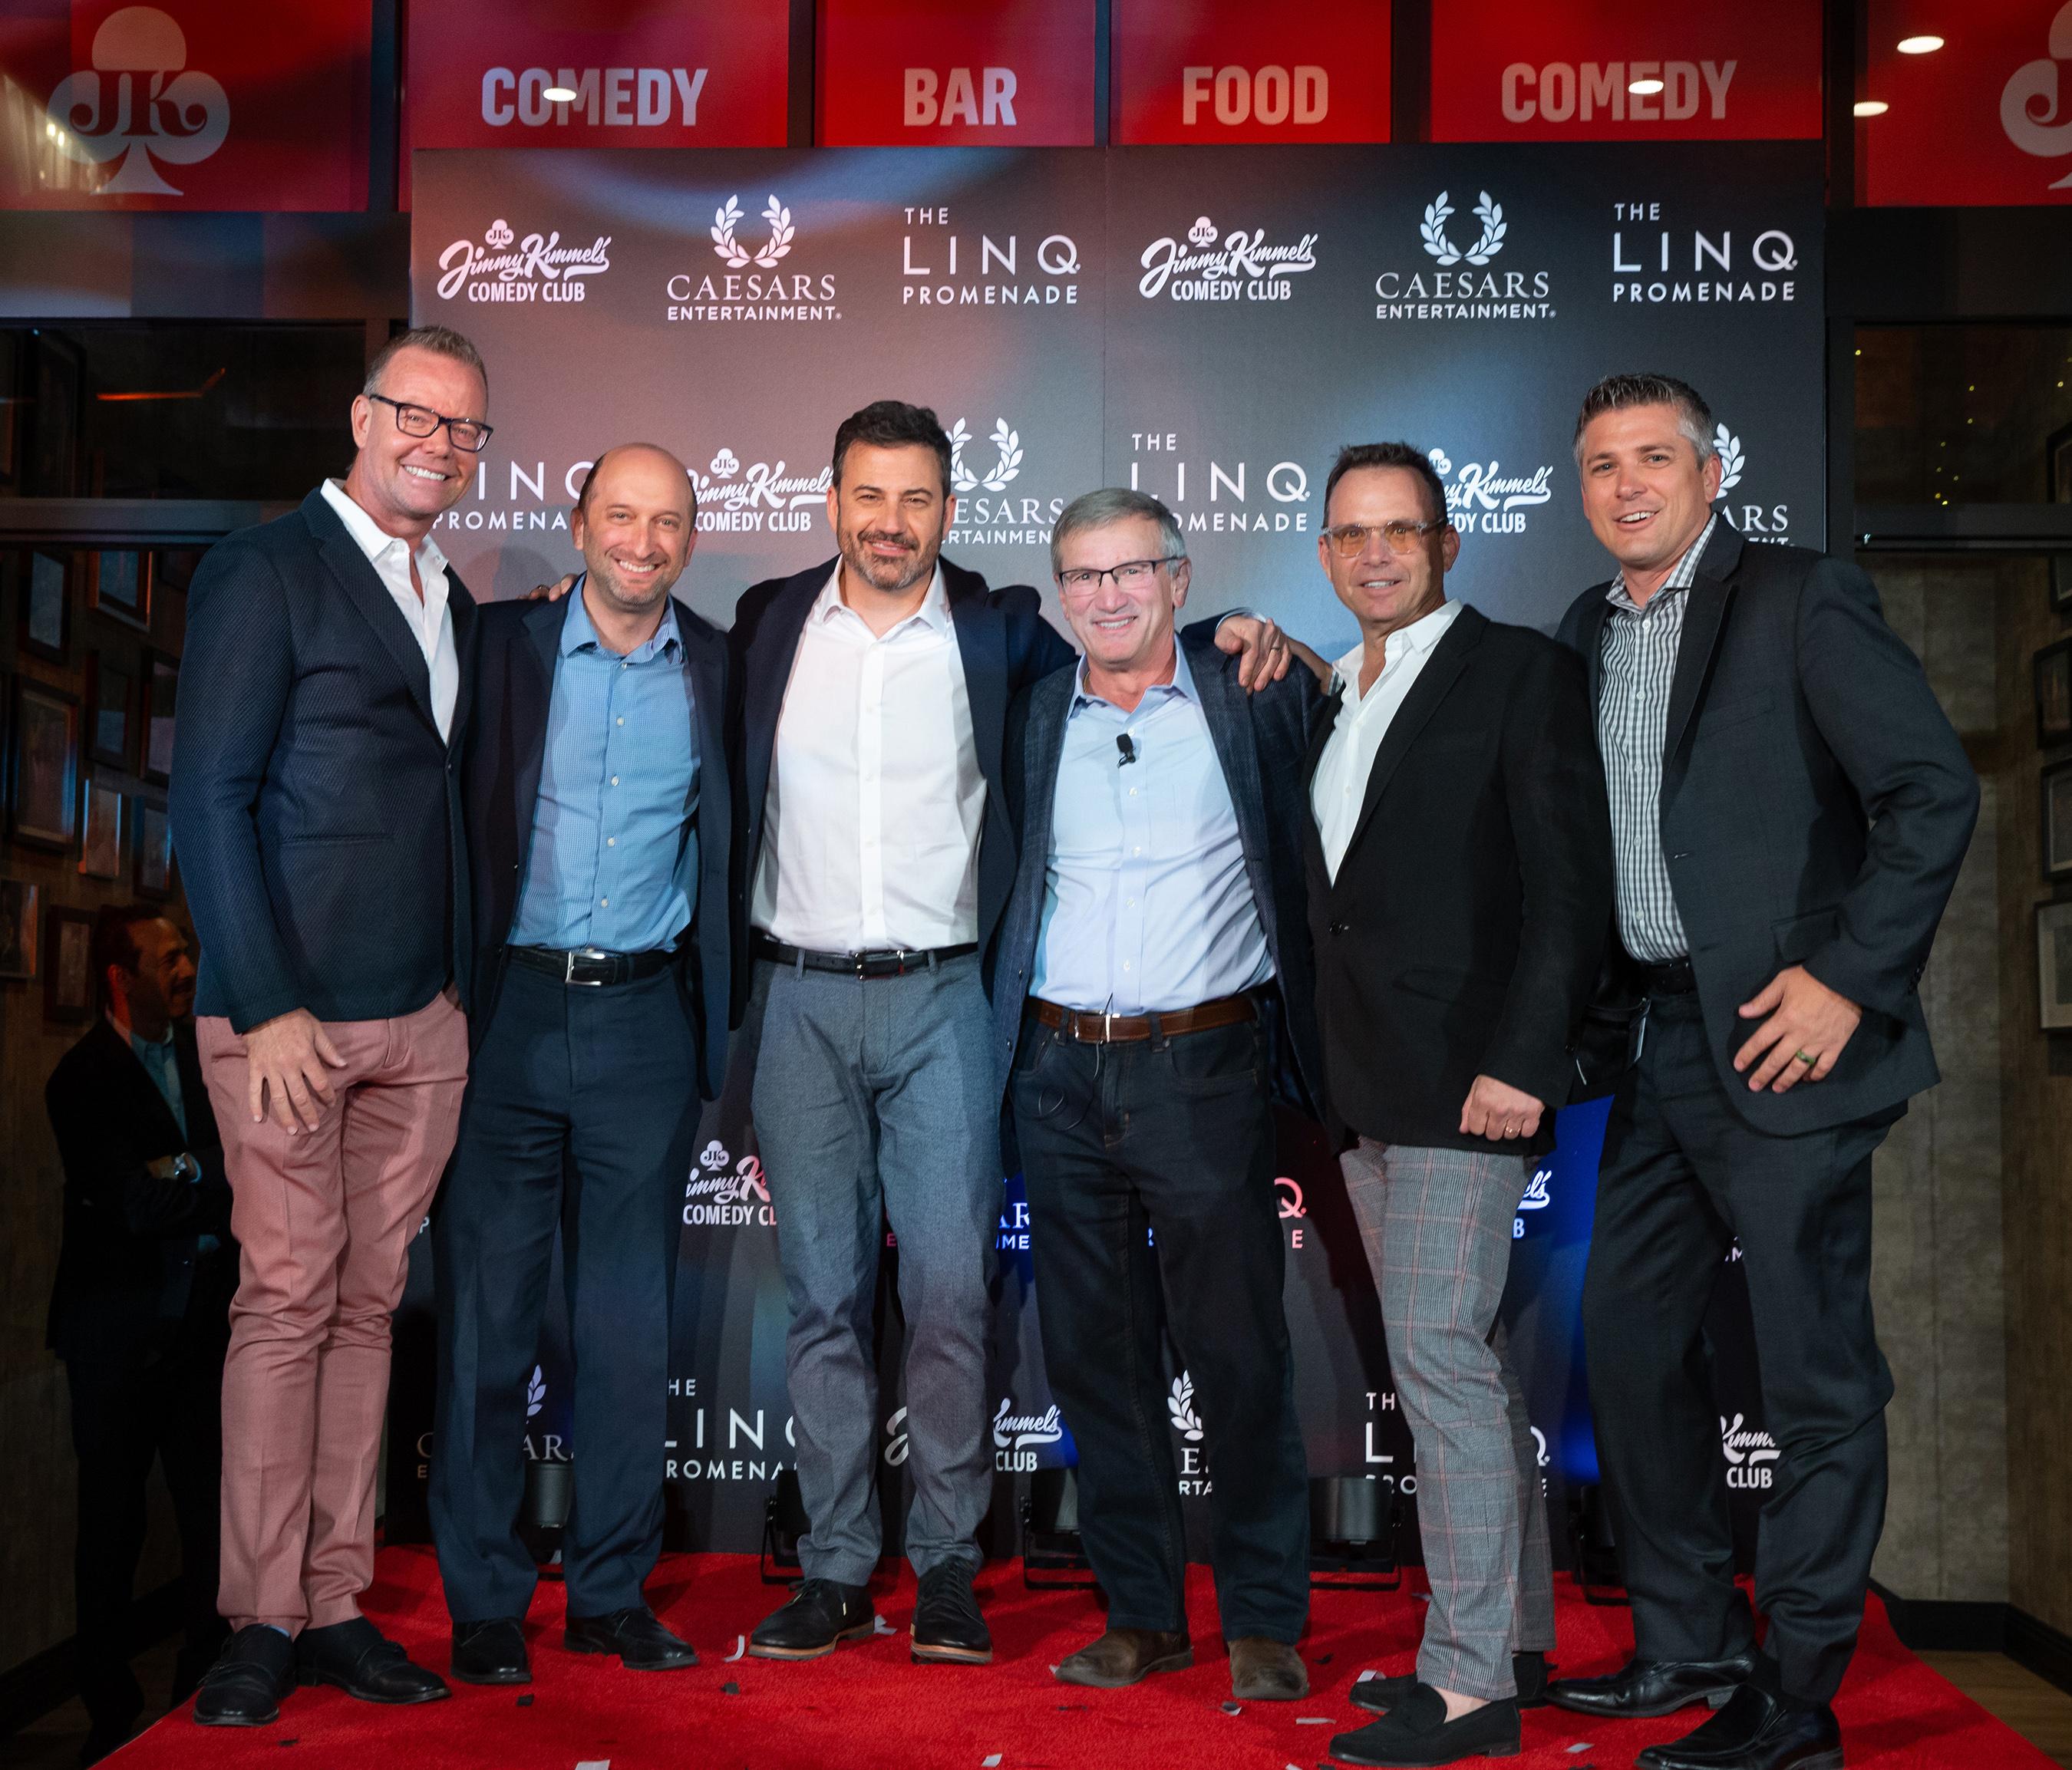 Jimmy Kimmel's Comedy Club Grand Opening - Shaun Swanger, Jason Gastwirth, Jimmy Kimmel, Tony Rodio, Michael Gruber, Damian Costa (Photo Credit: Kabik Photo Group)